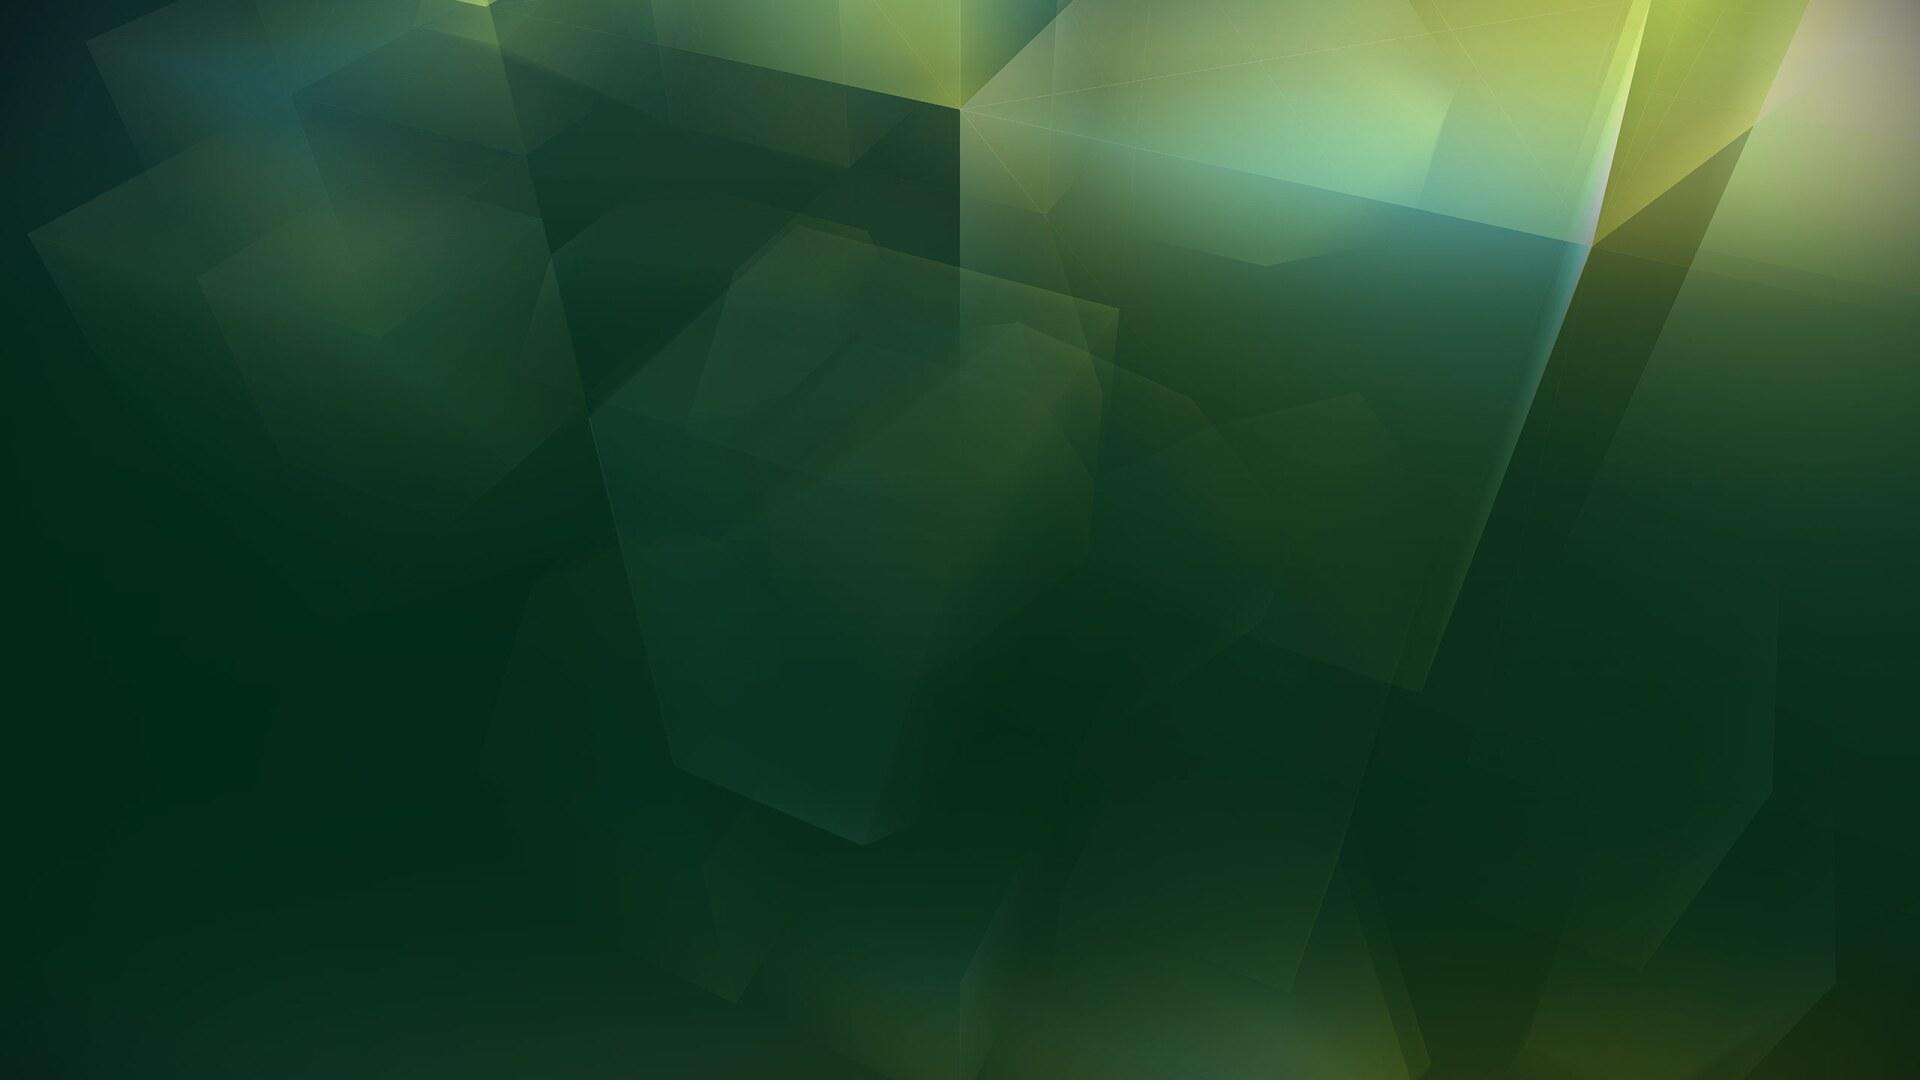 pibm-challenge-gradient-tcm9-585.jpg